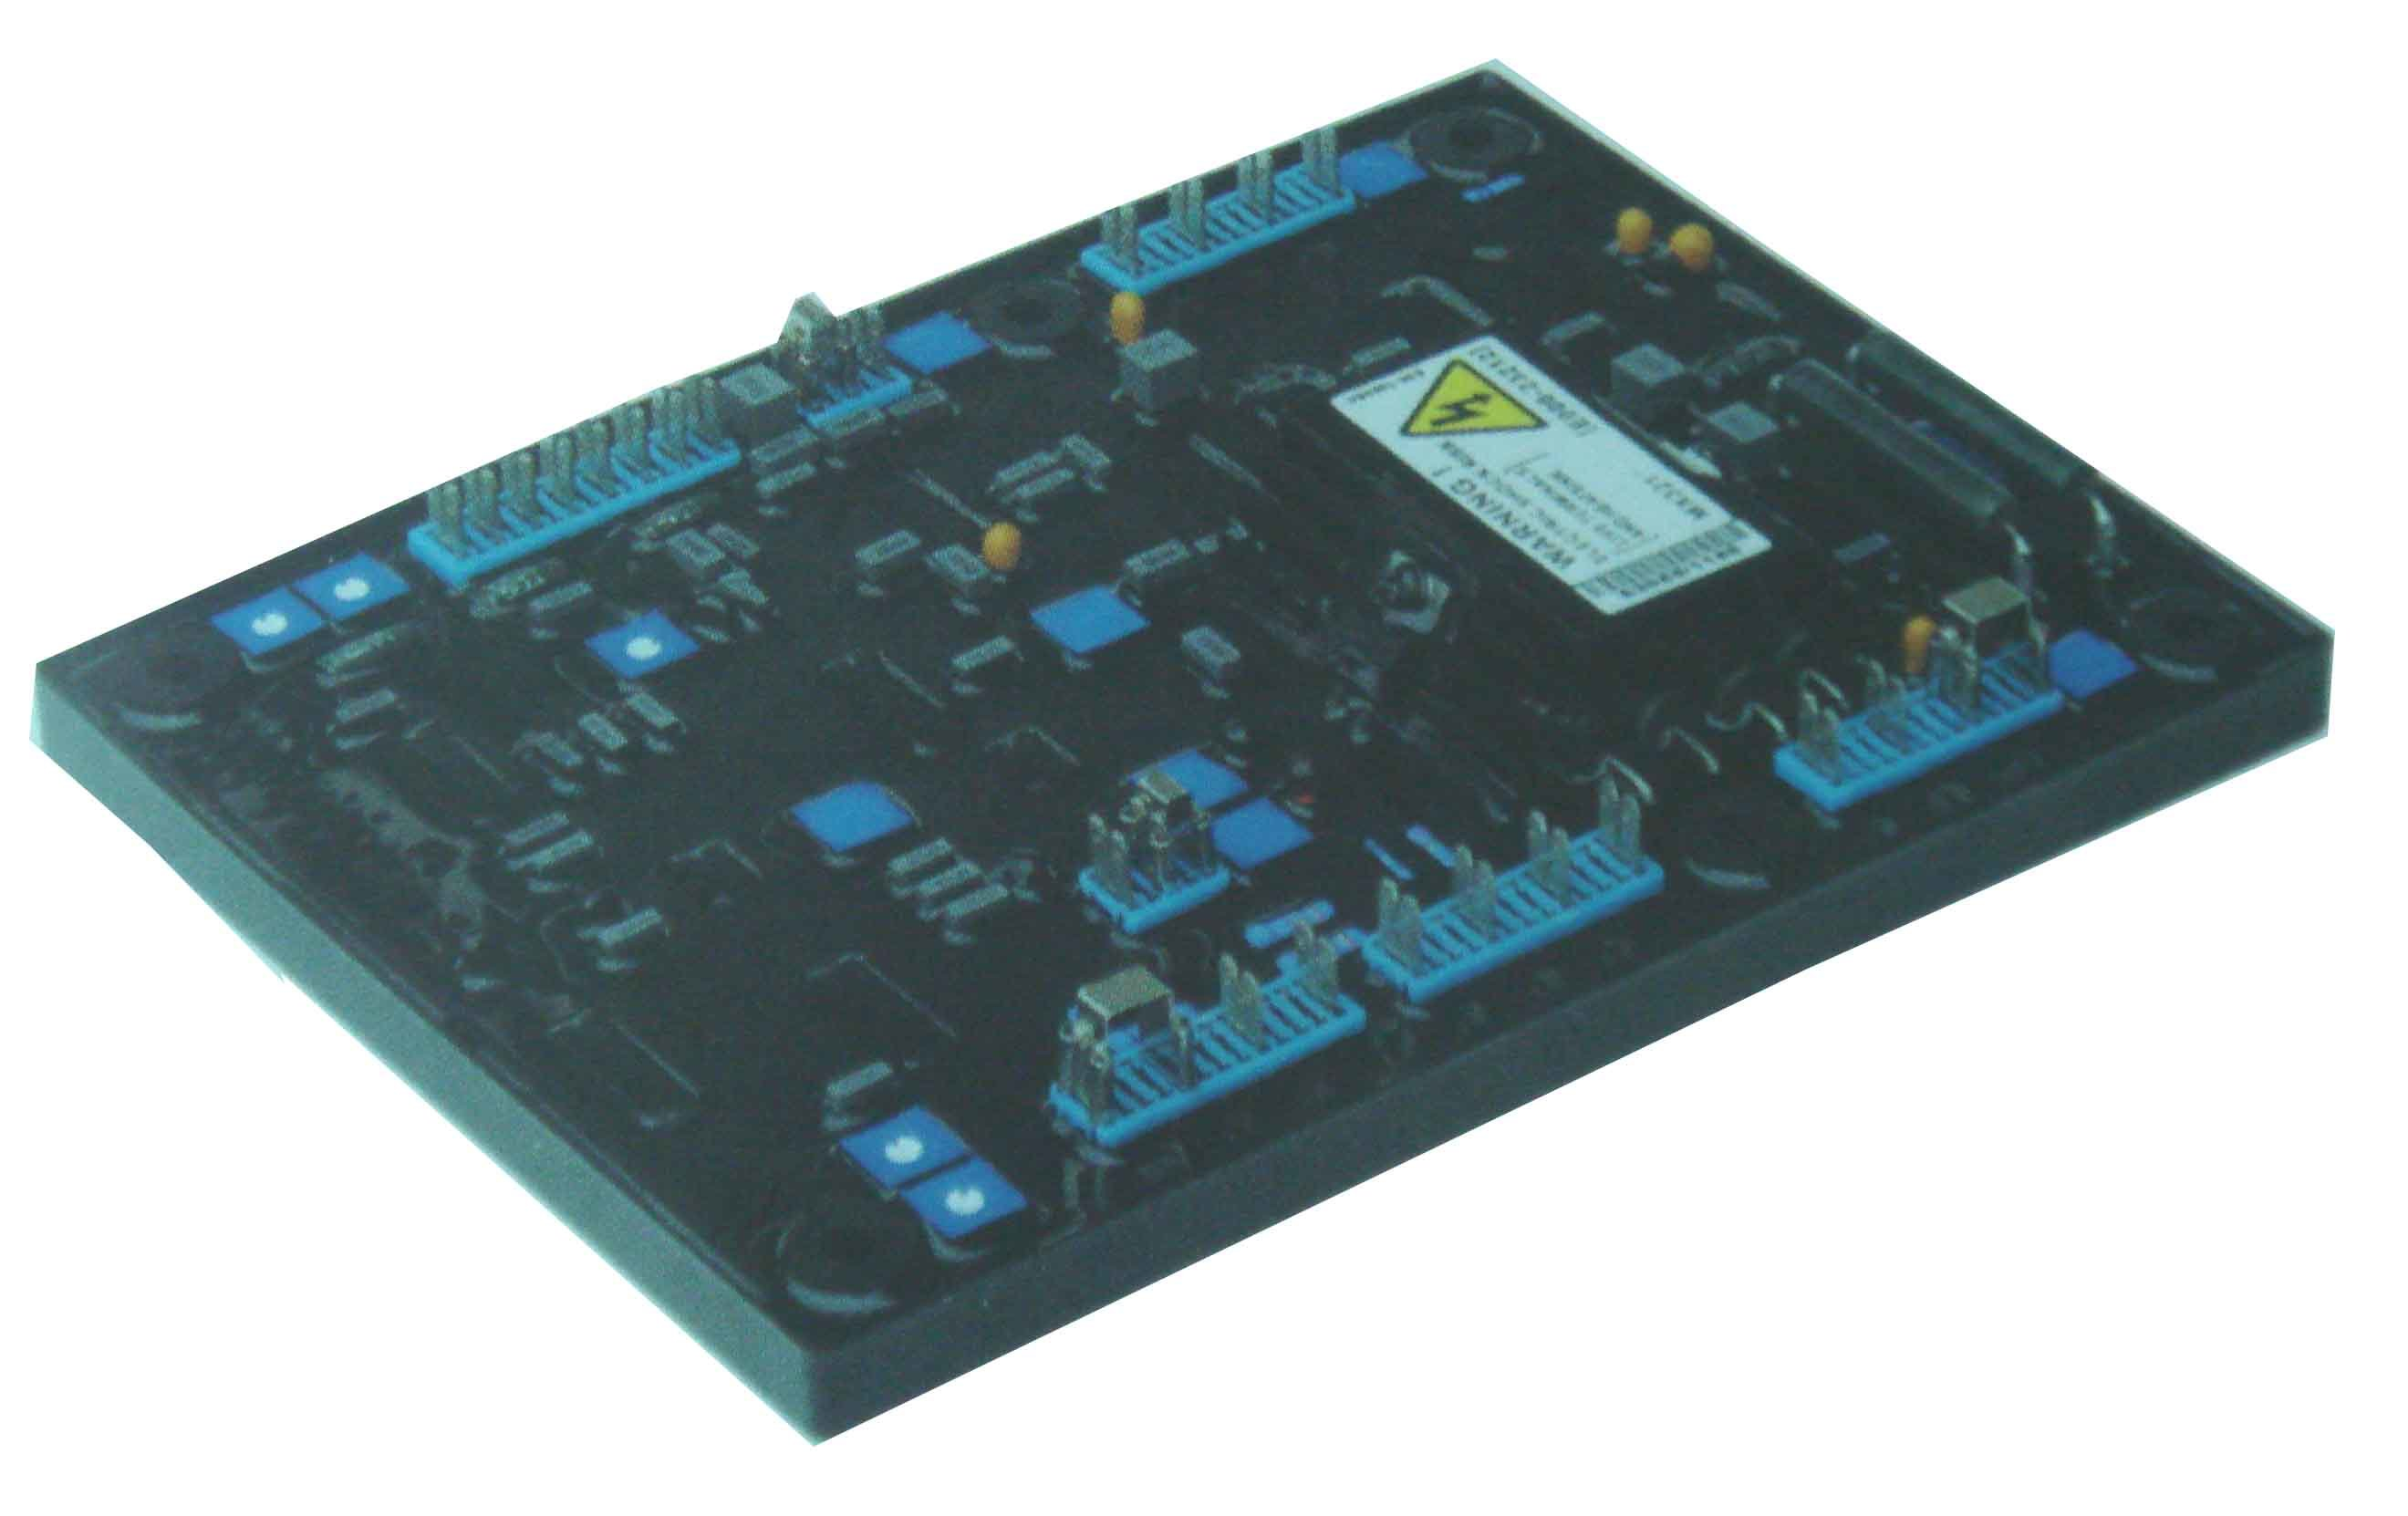 china automatic voltage regulator mx321 china avr. Black Bedroom Furniture Sets. Home Design Ideas